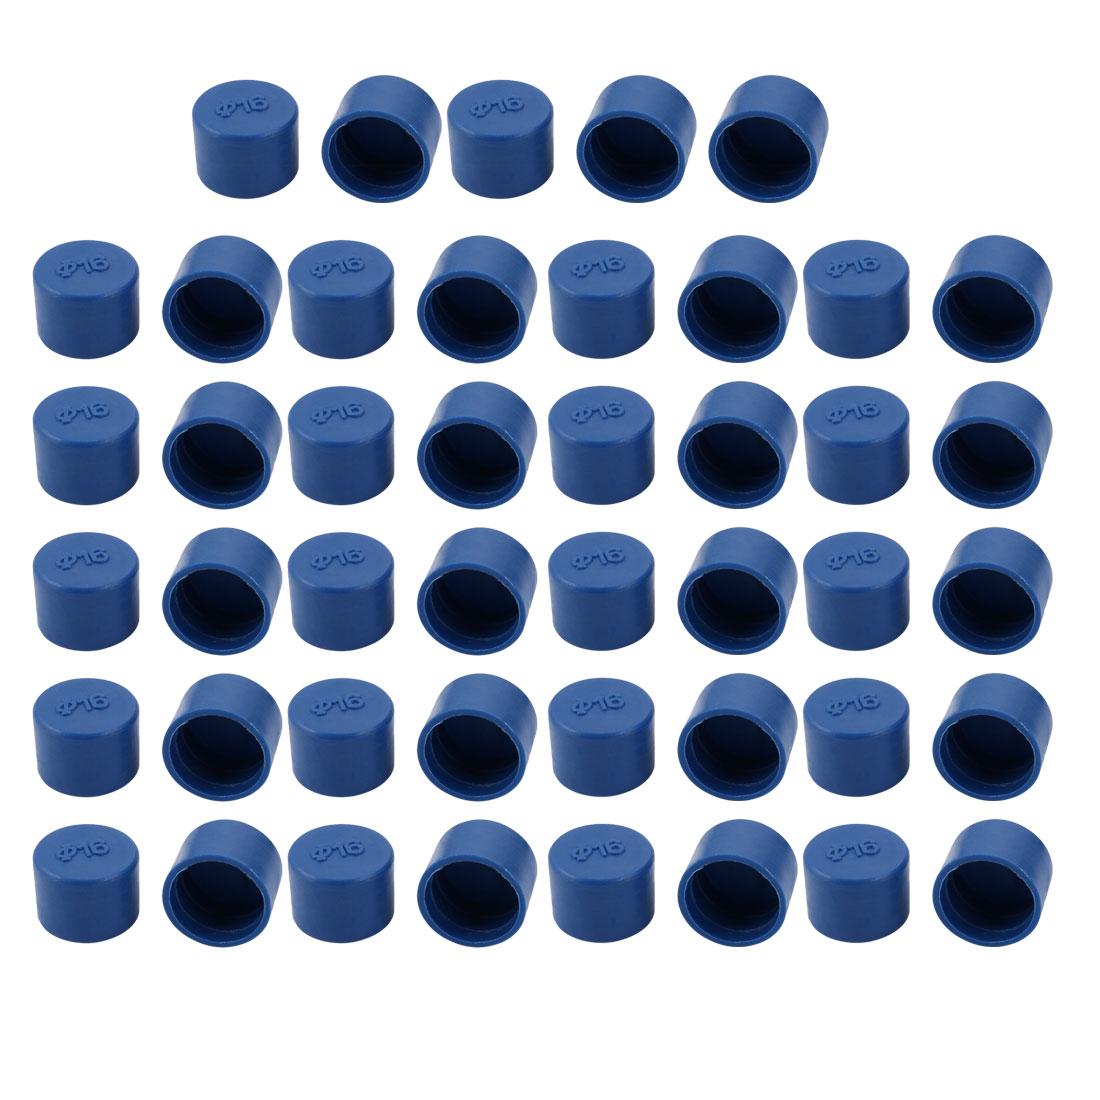 45pcs 16mm Inner Dia PE Plastic End Cap Bolt Thread Protector Tube Cover Blue